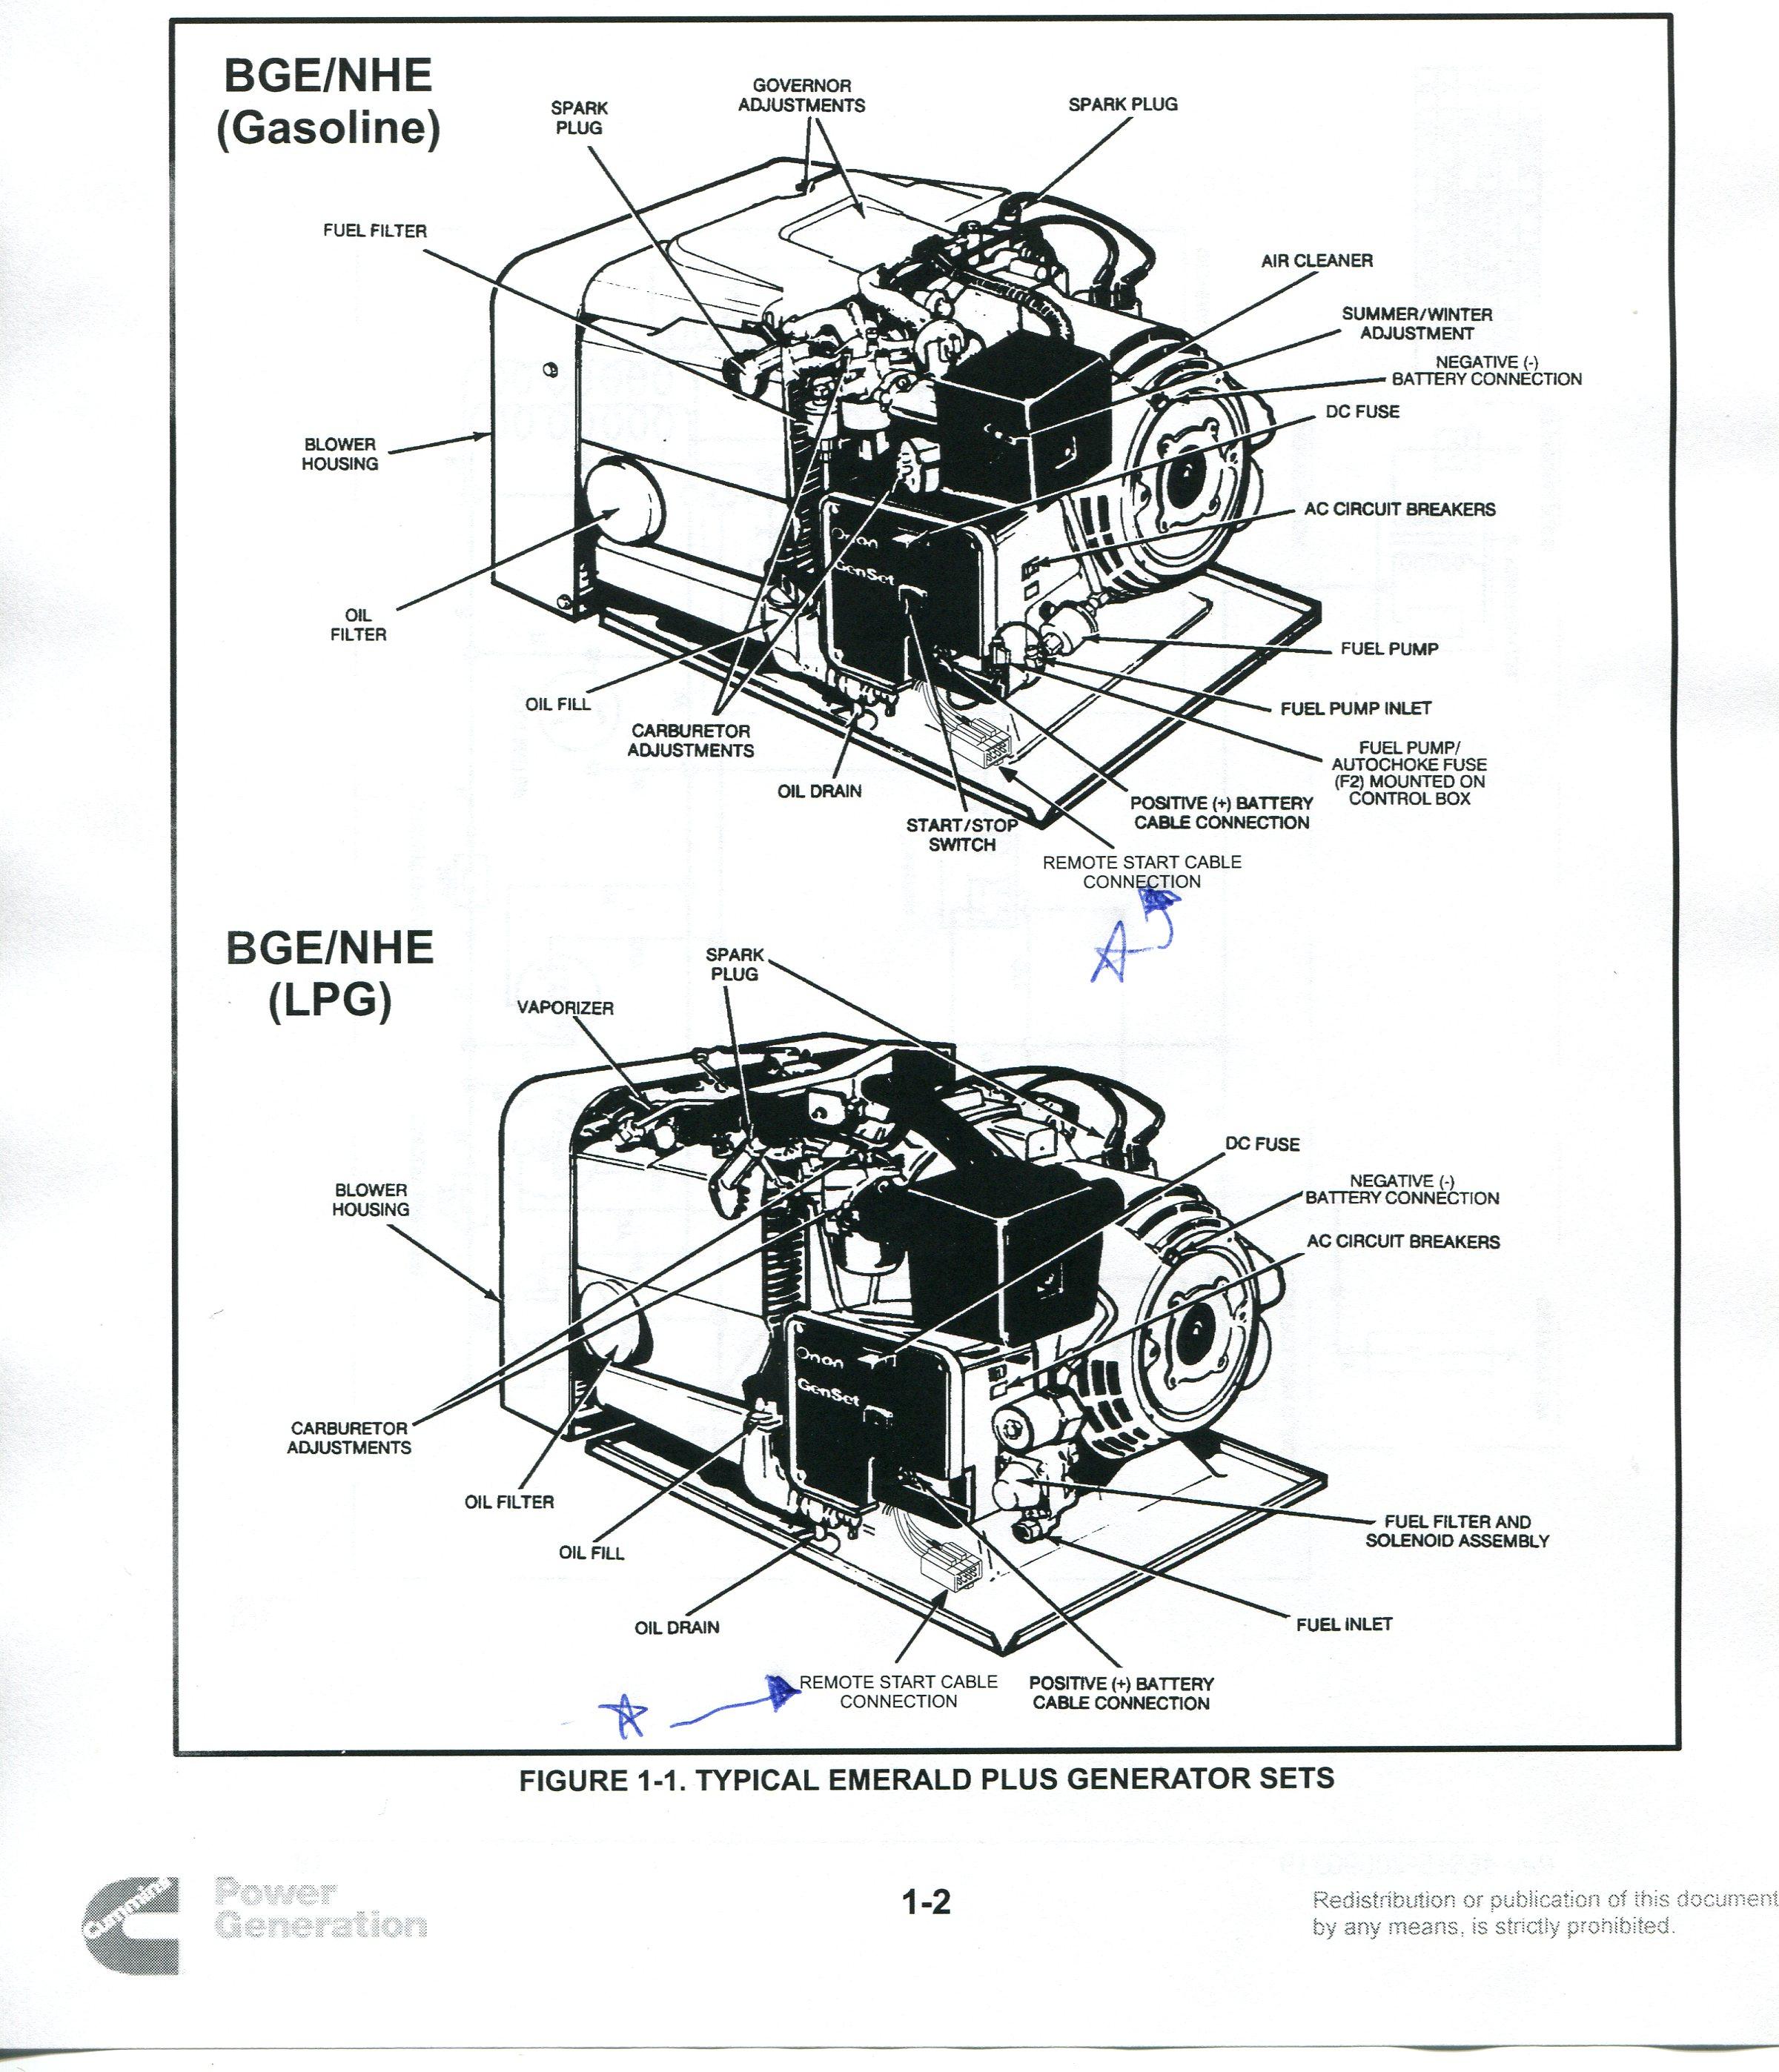 Onan Generator Remote Switch Wiring Diagram - Wiring Diagrams Option - Onan 4000 Generator Wiring Diagram